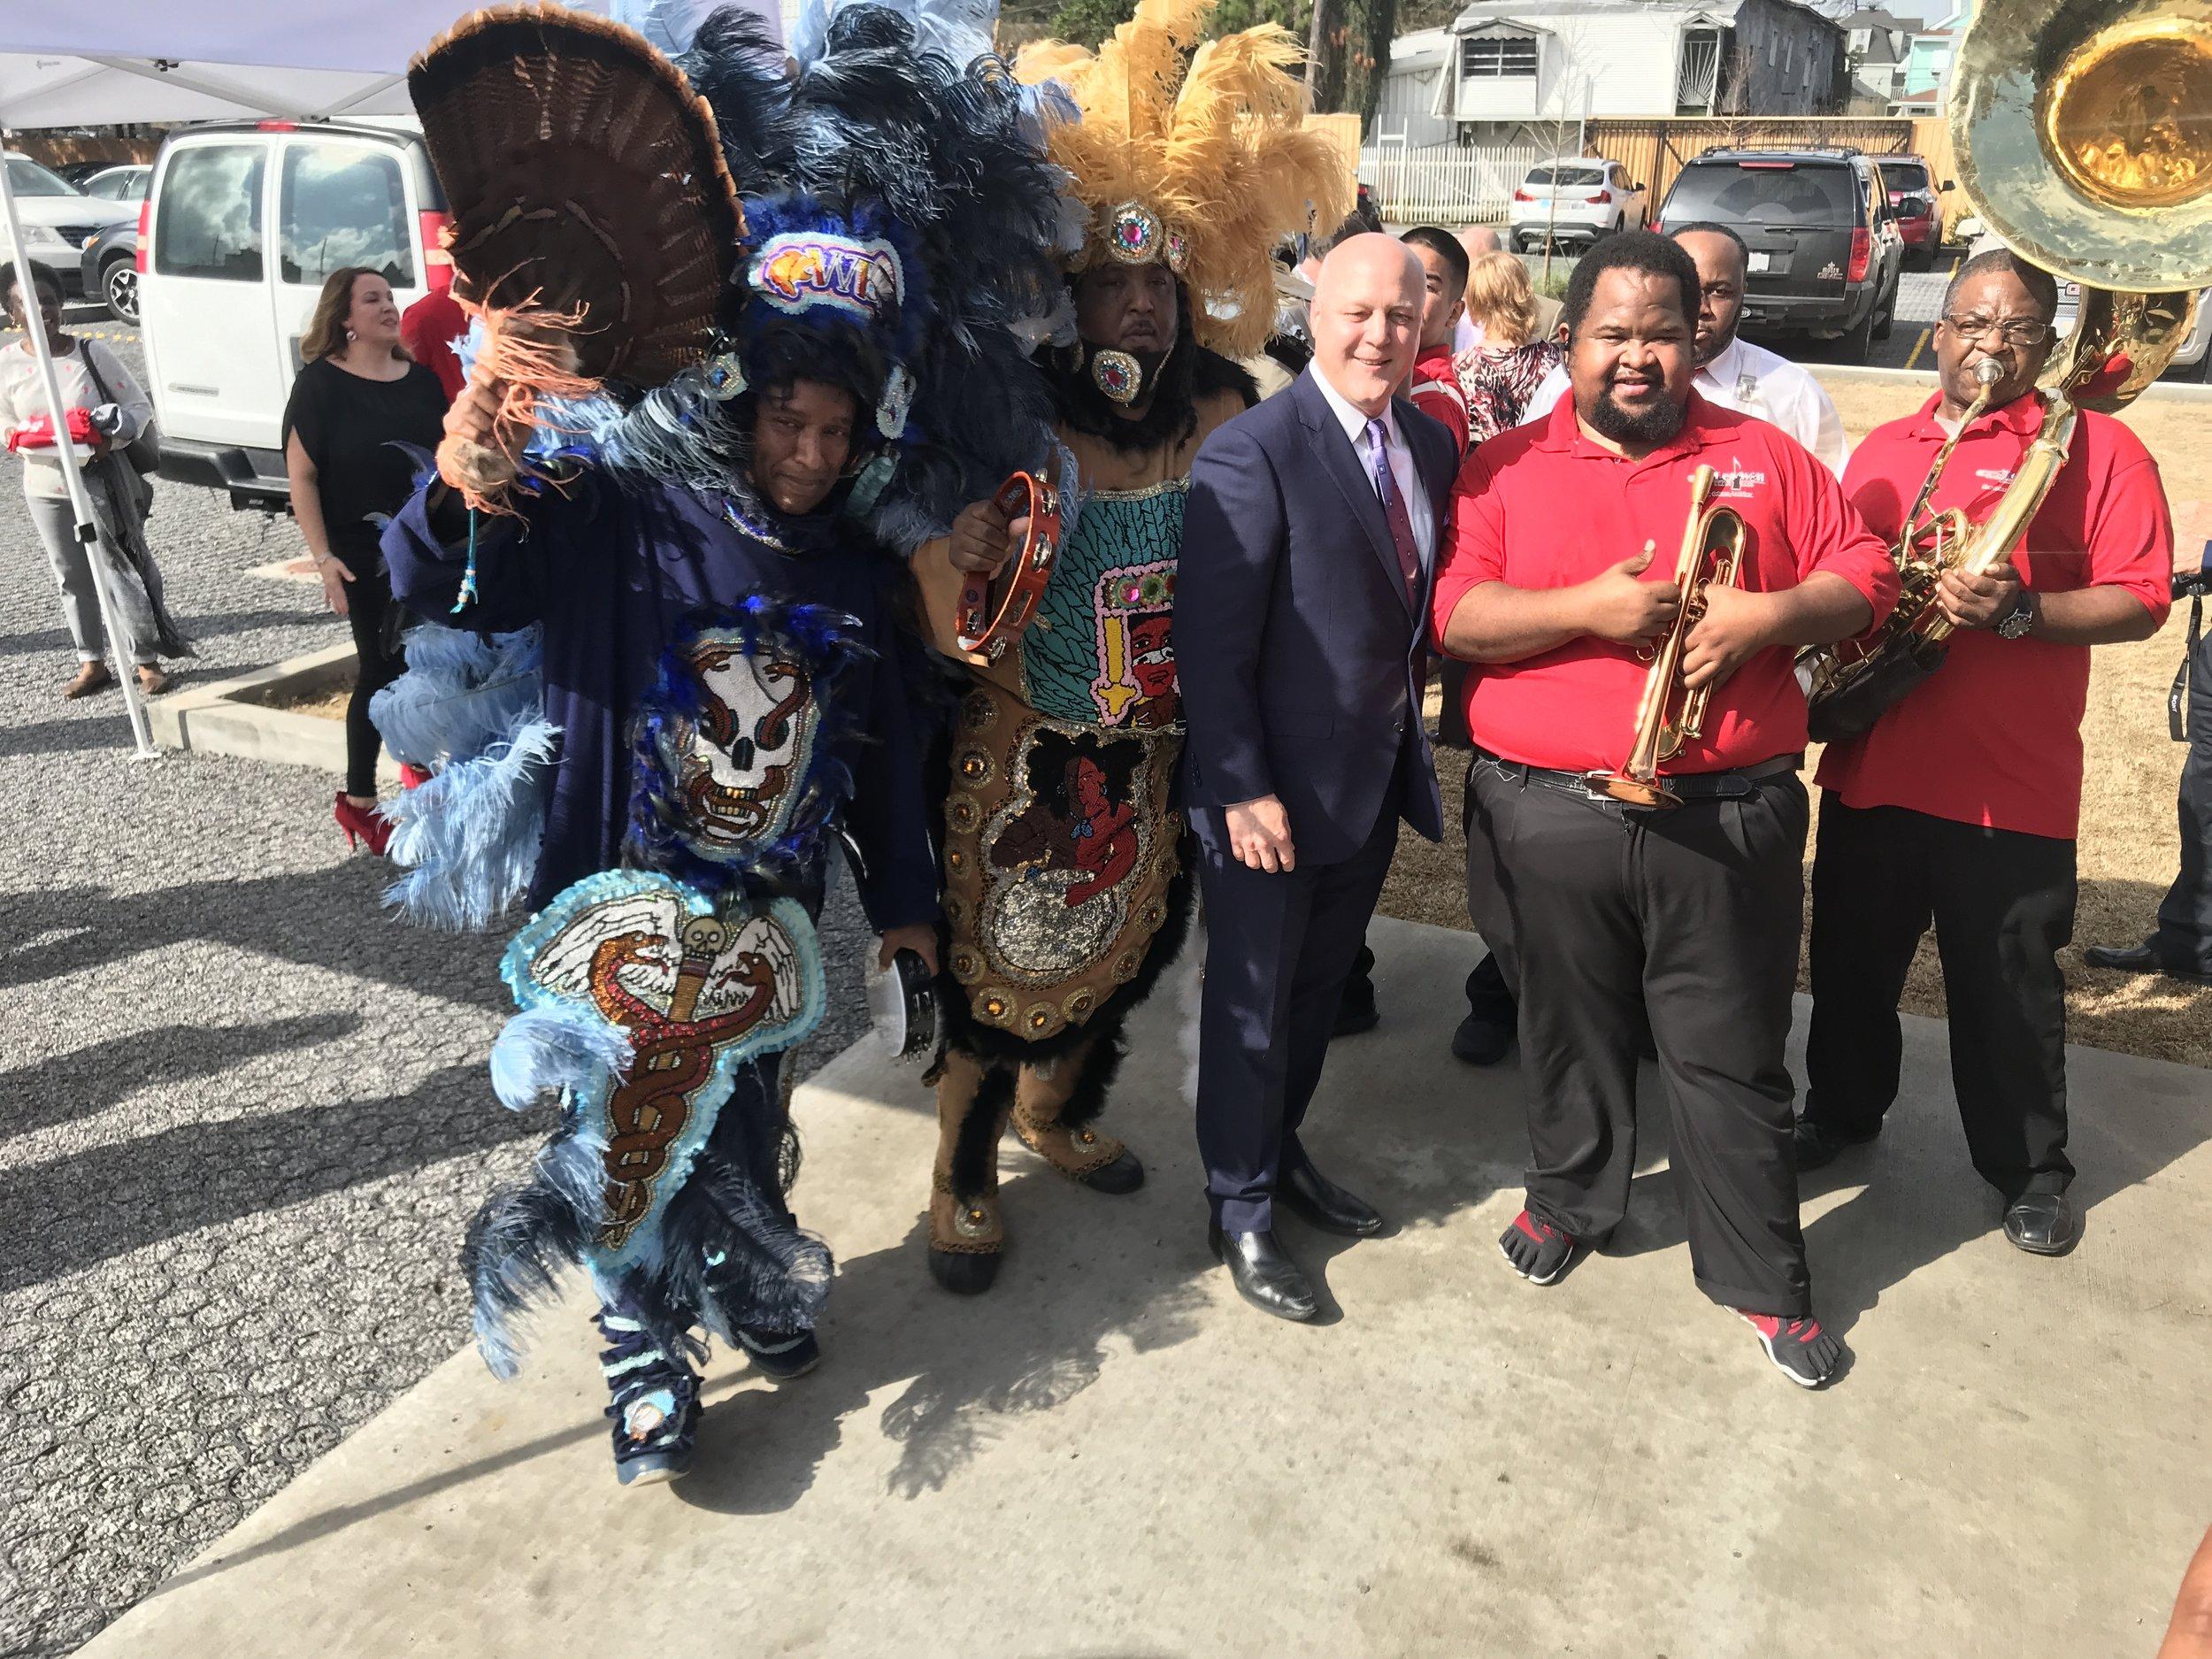 Ruby Slipper Opening Mayor Mardi Gras Indians